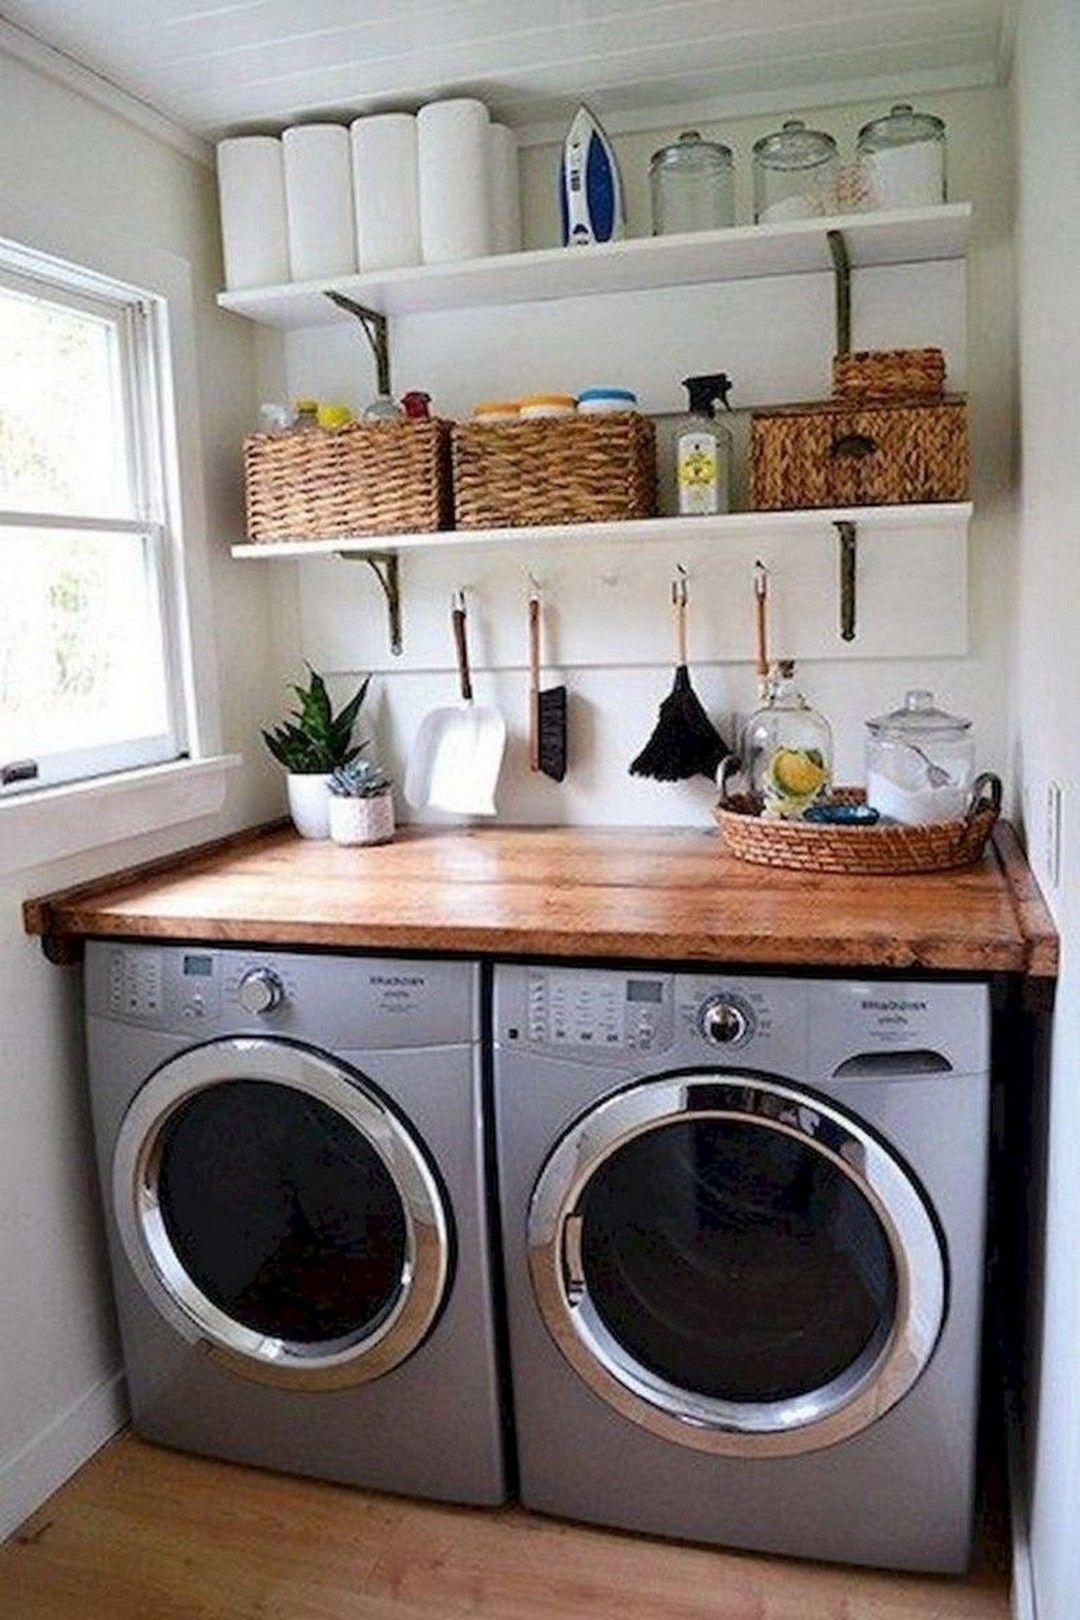 Pin By Biljana Greenwell On Ikea Kitchen Storage Laundry Room